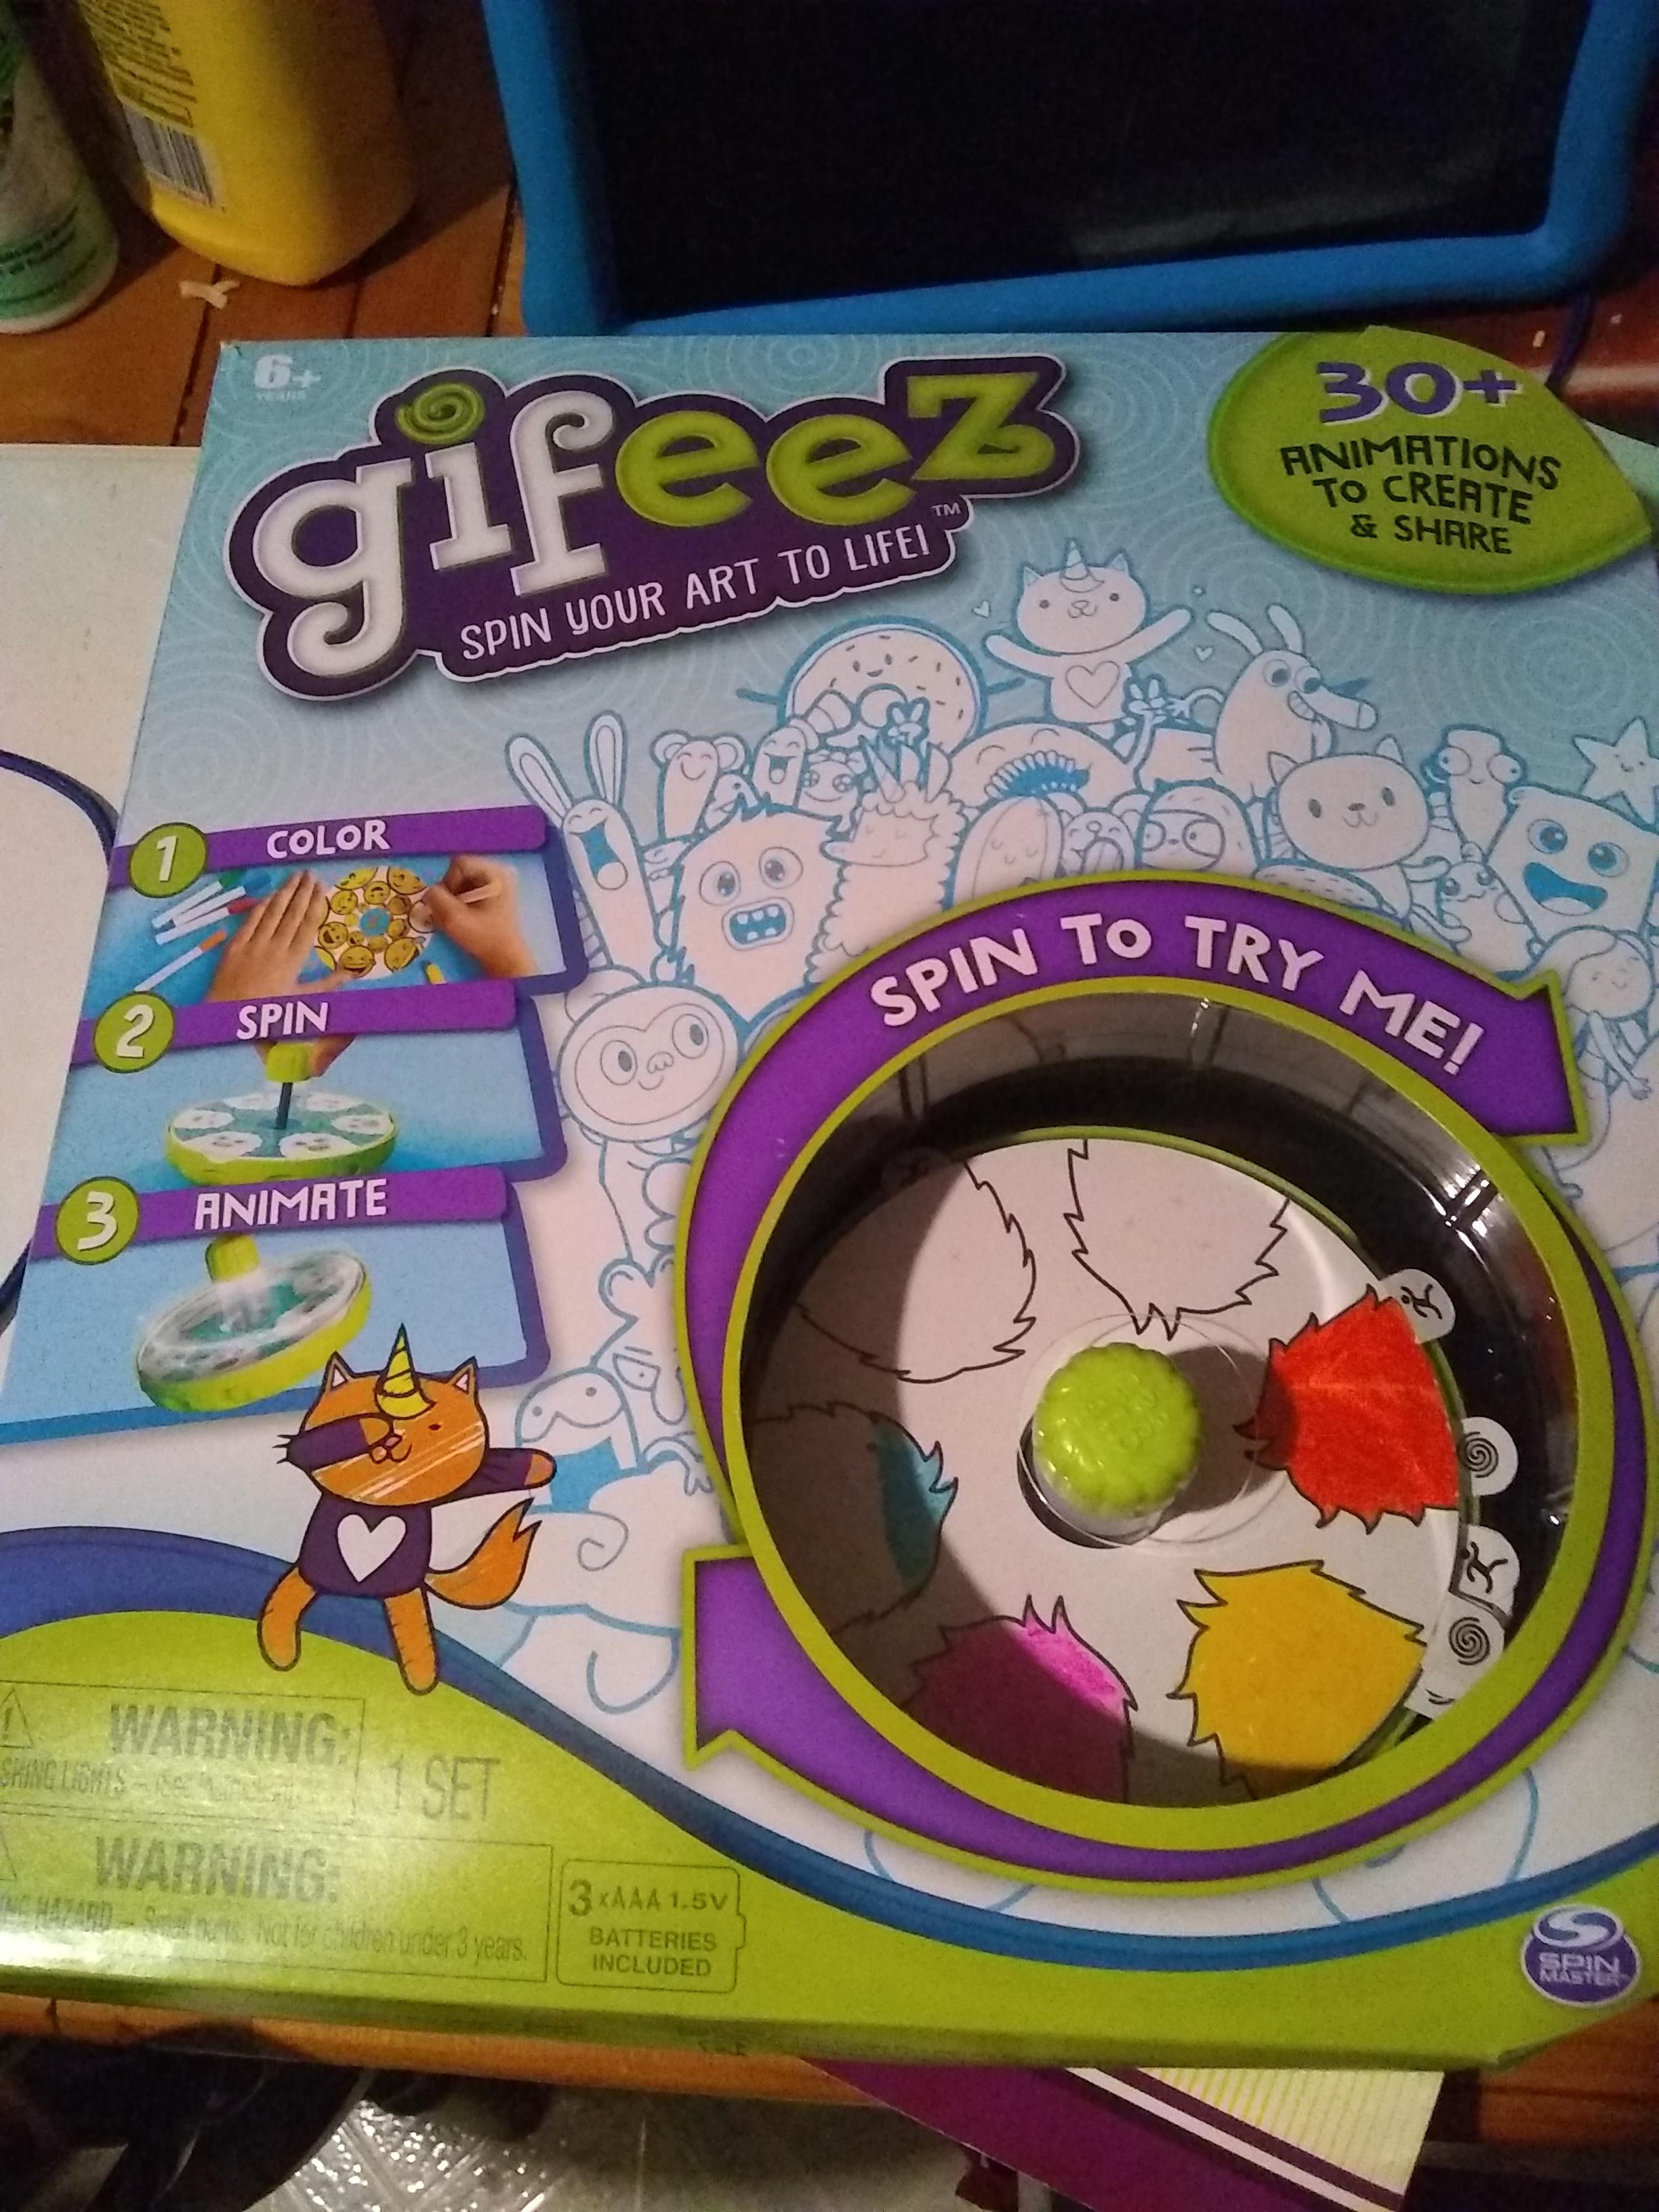 Gifeez Spin Studio Craft Activity Kit new in box